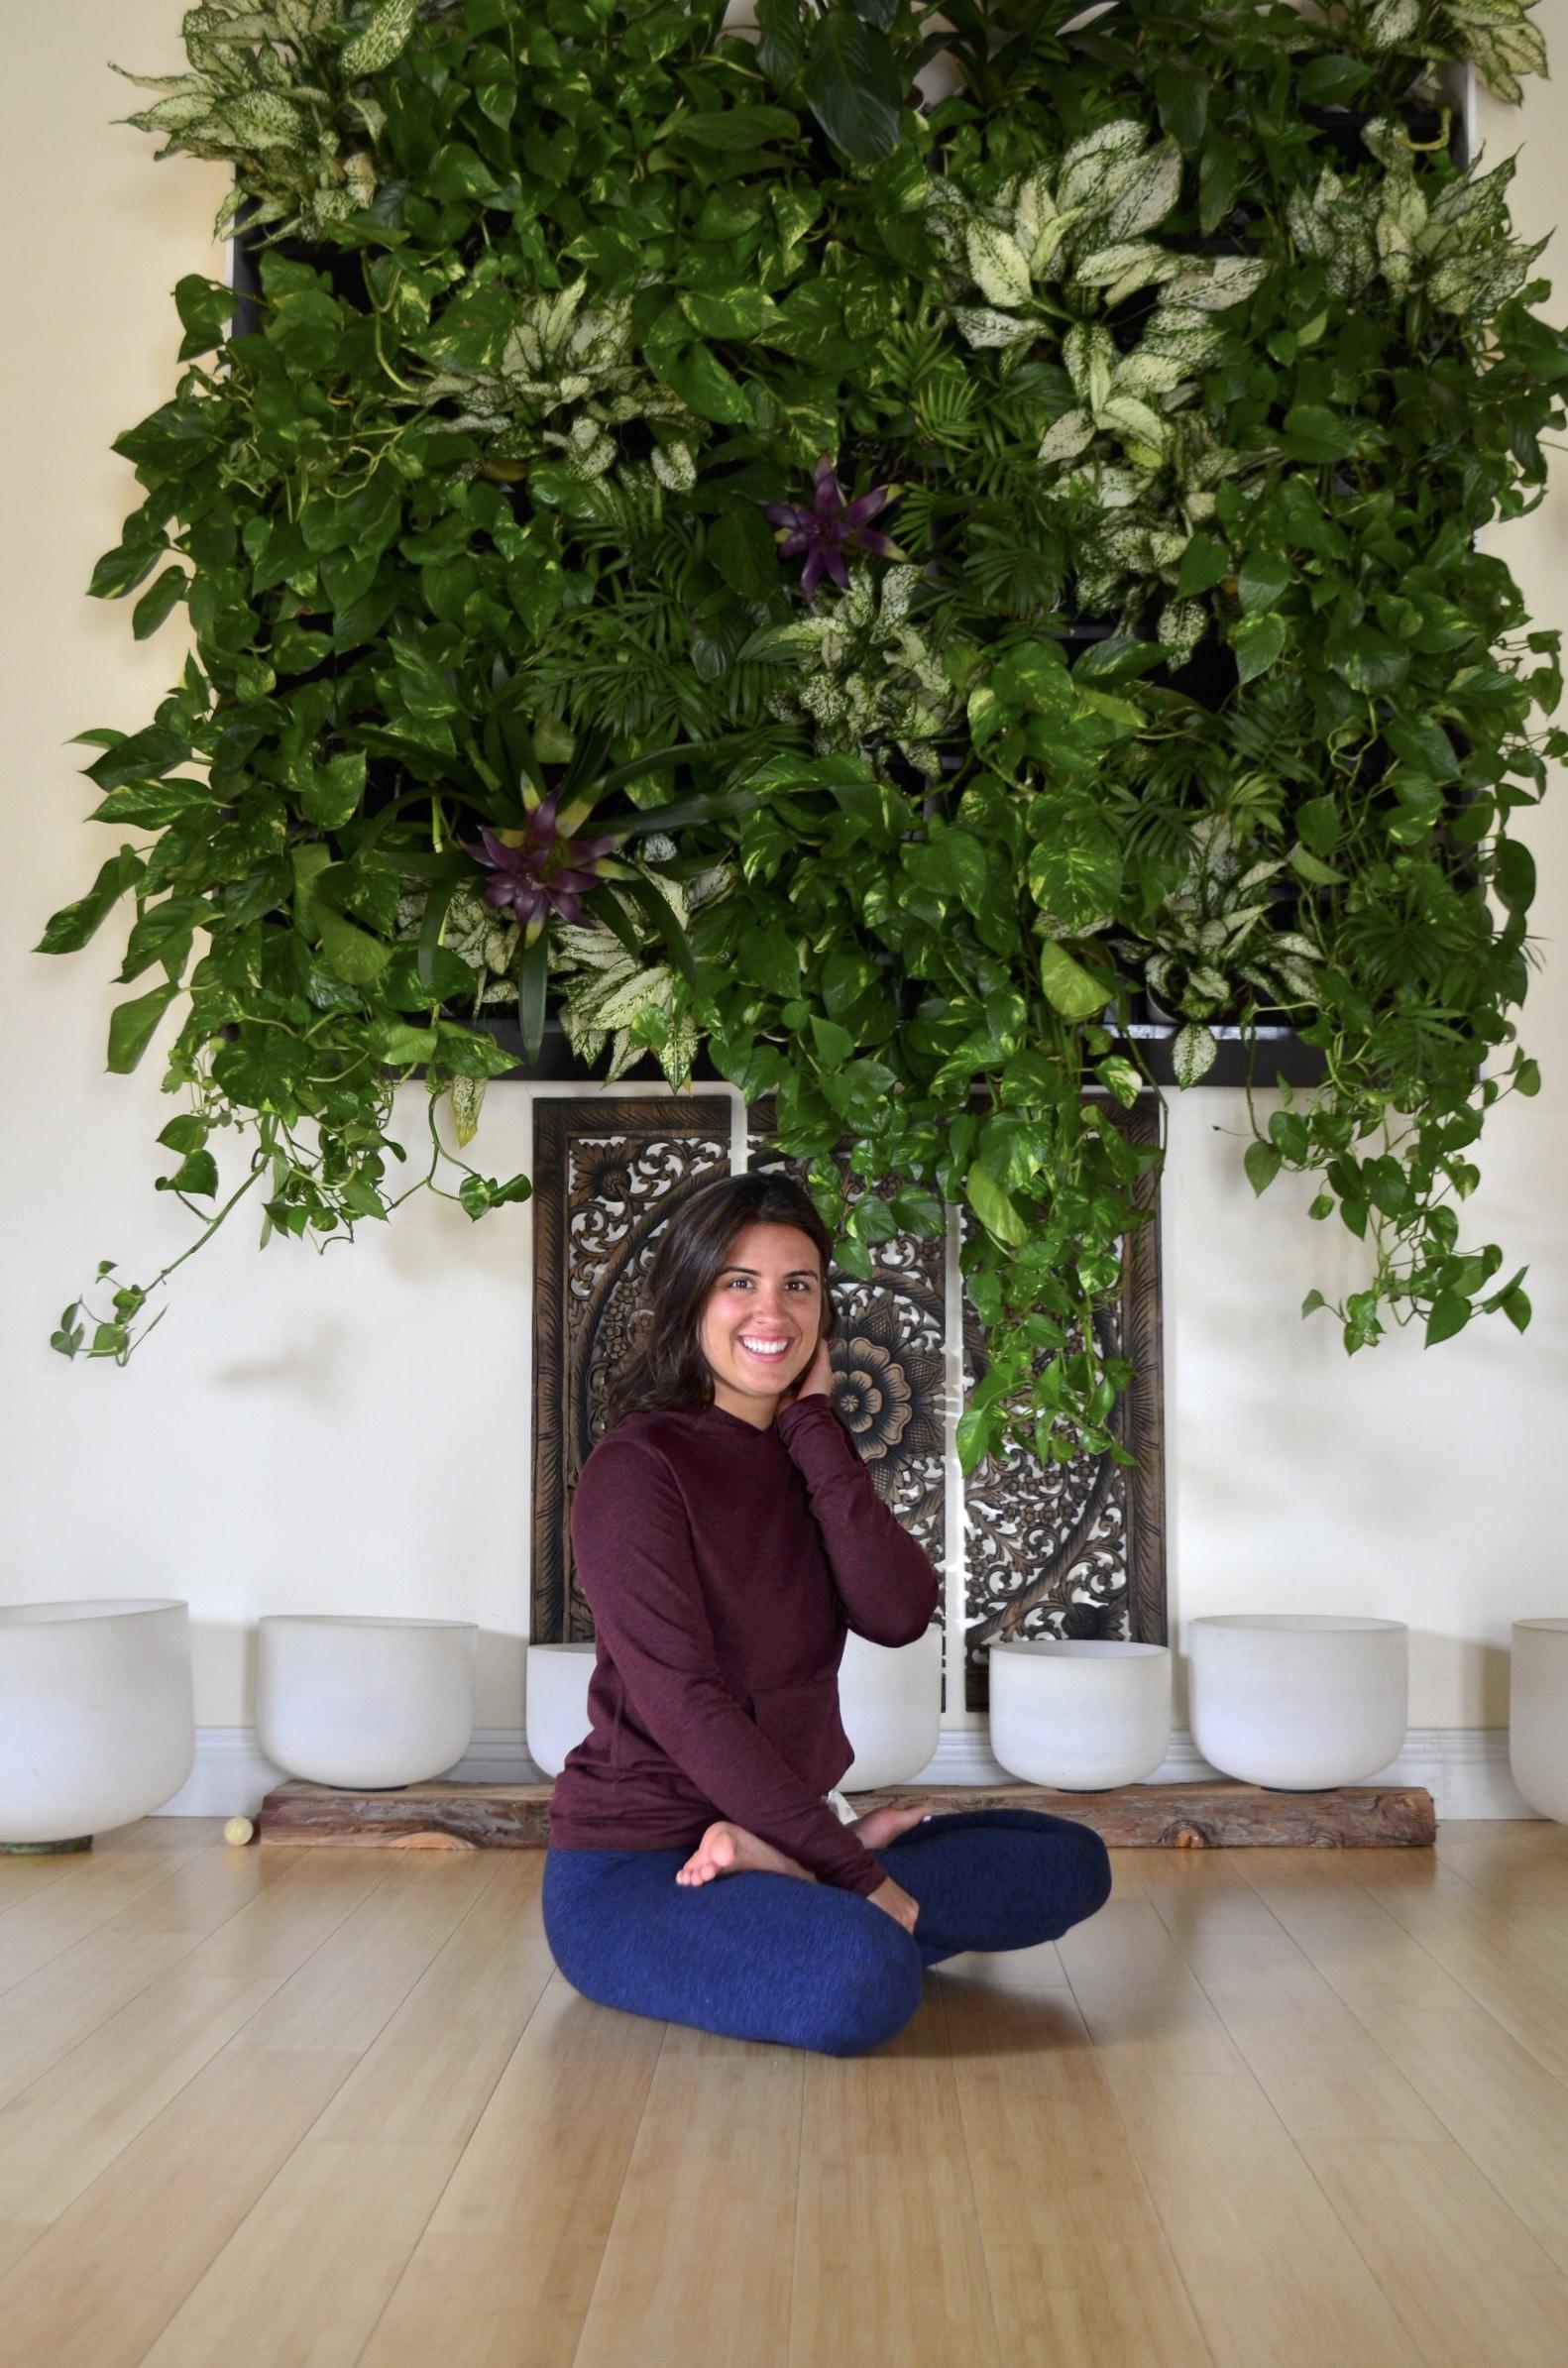 Lotus pose & pothos plants.